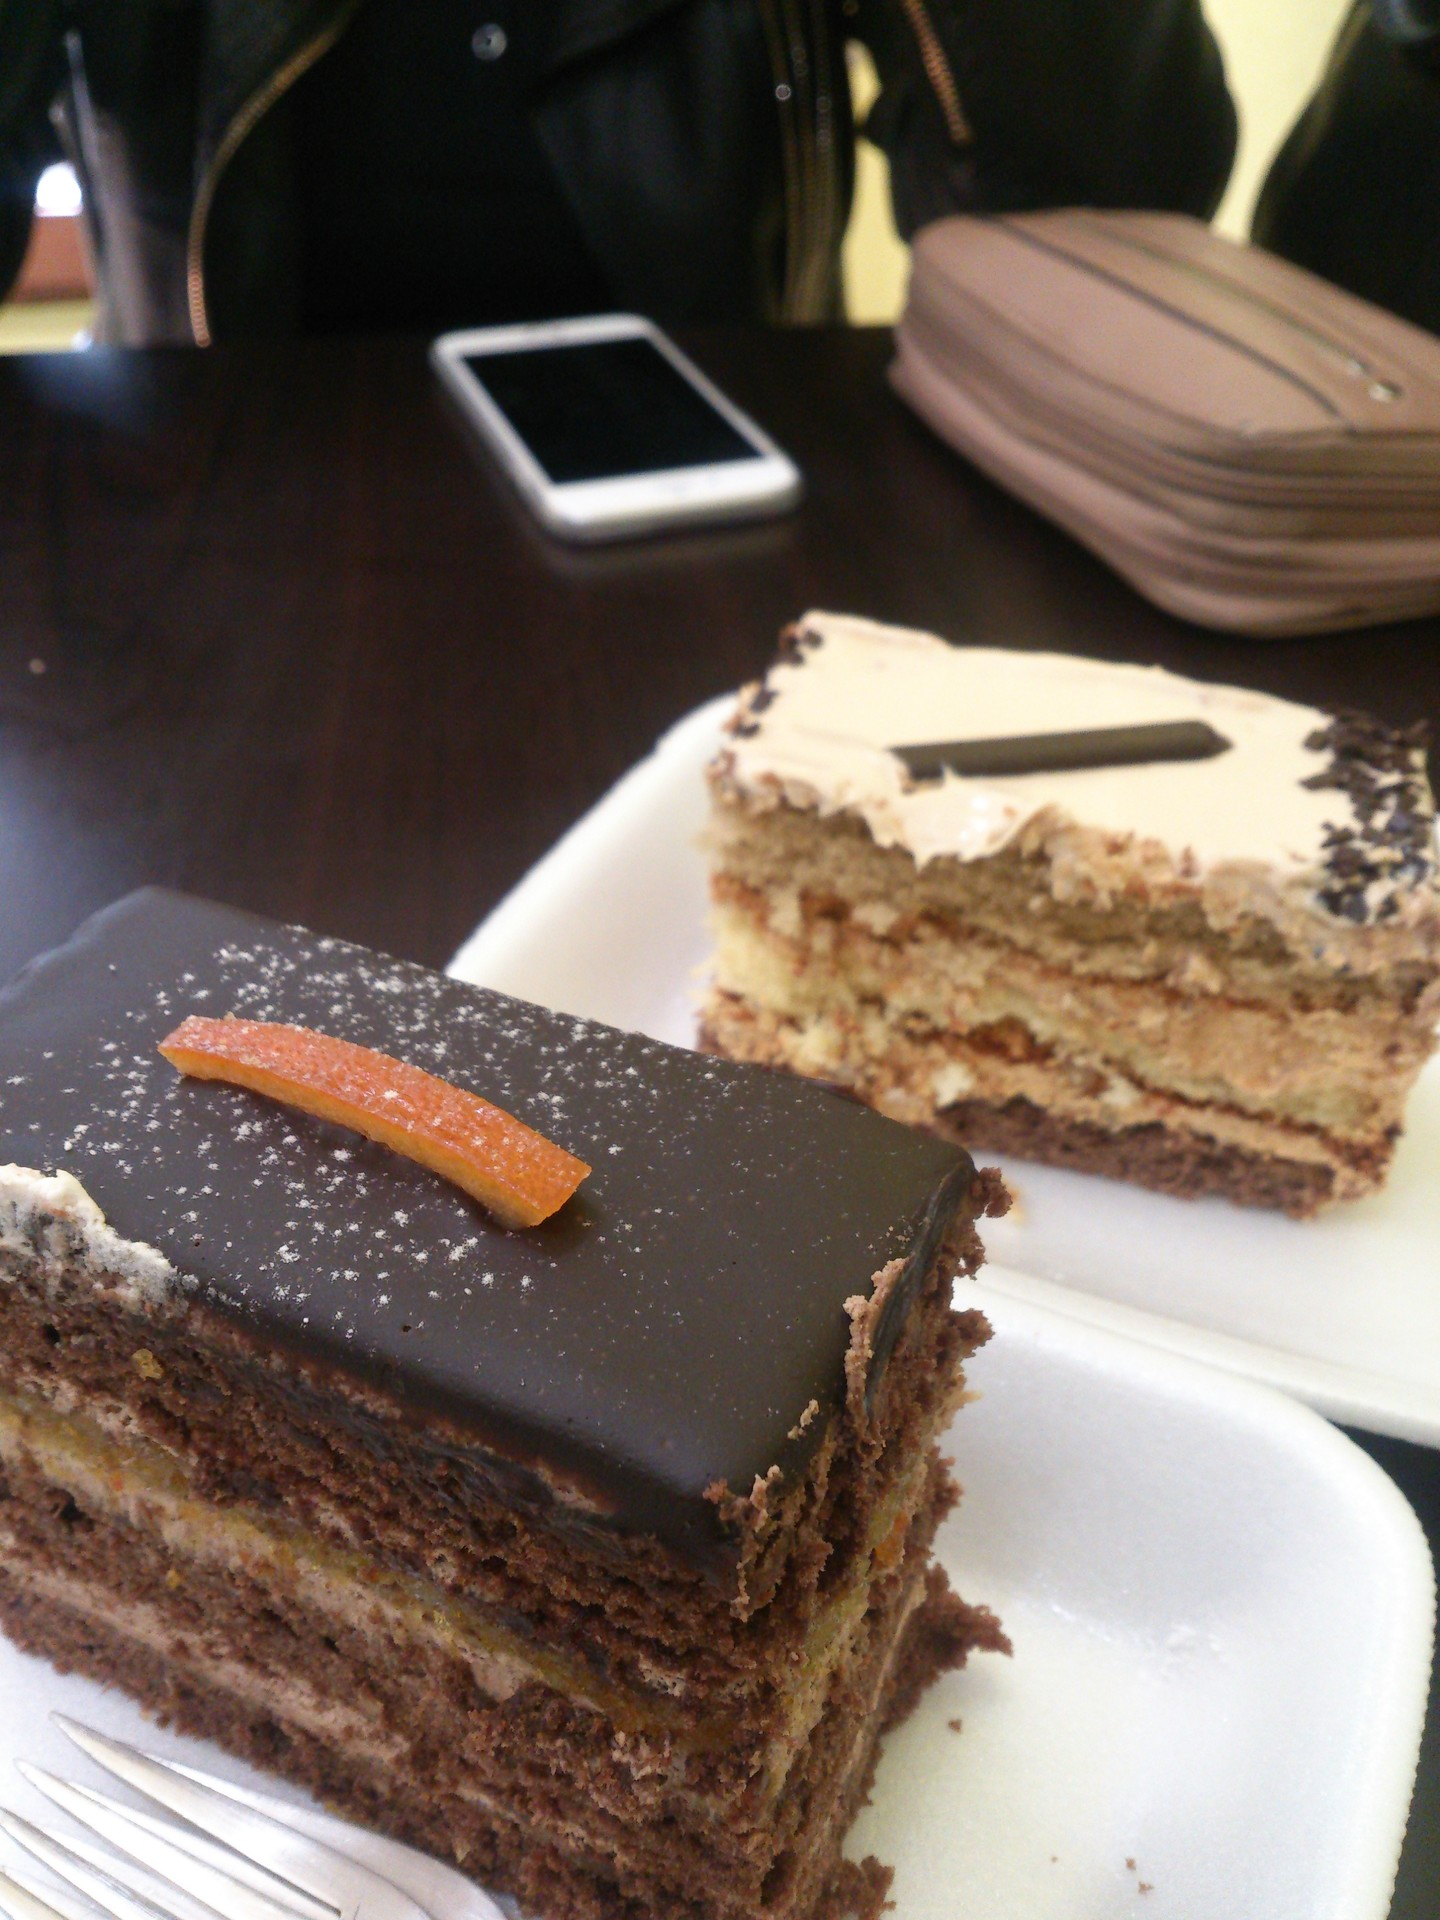 le-torte-di-tbilisi-04afd8df8037cd0094b8